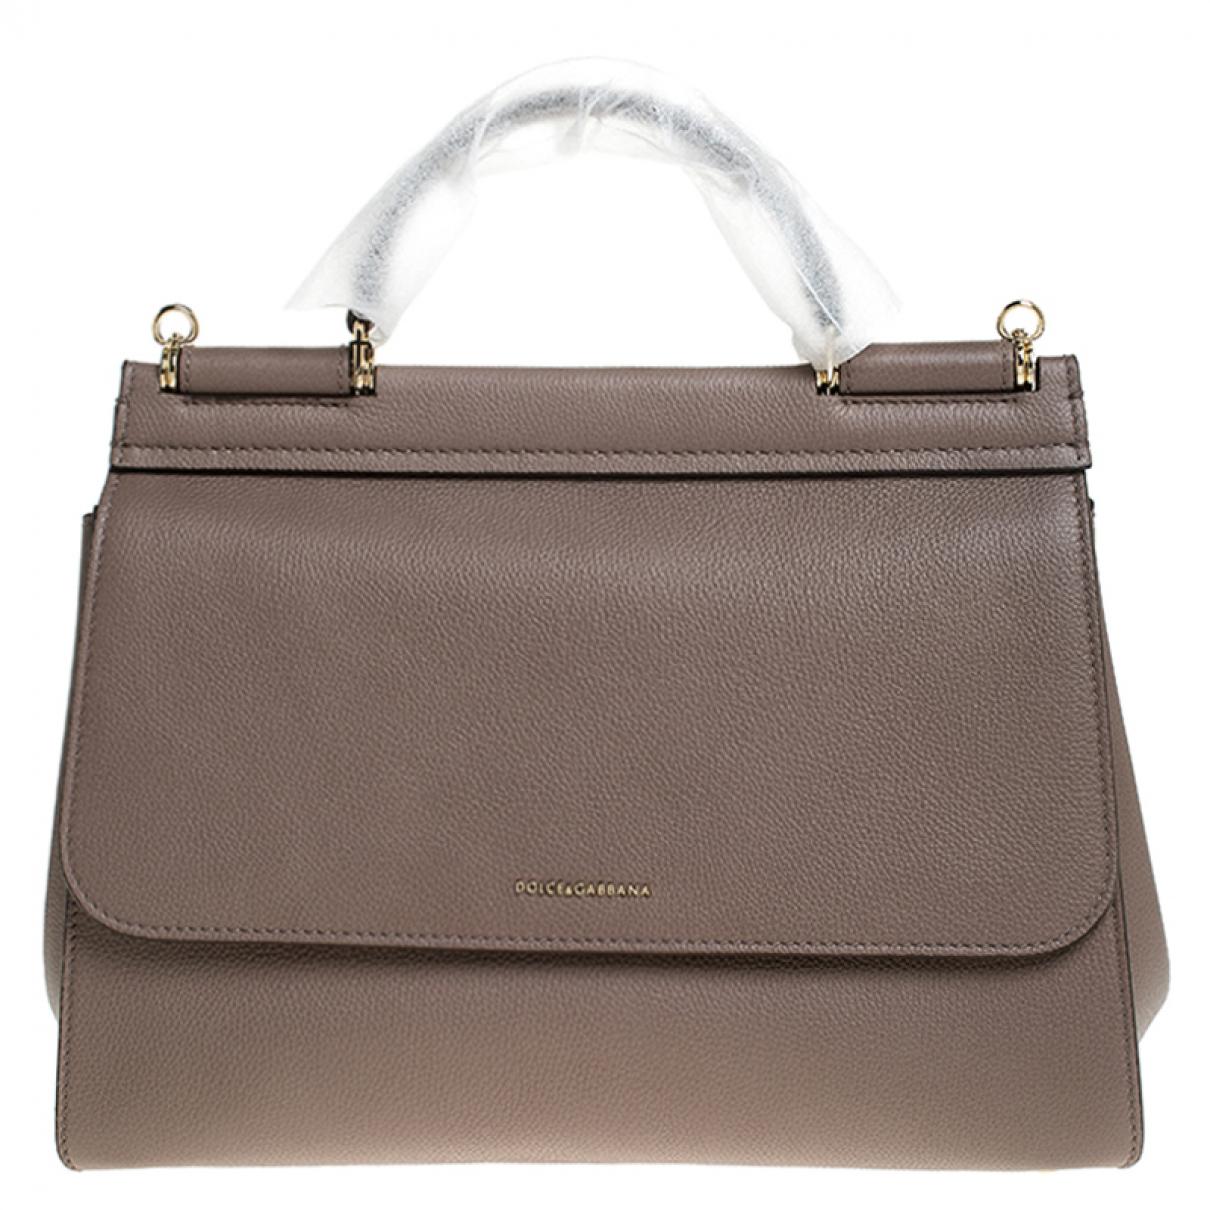 Dolce & Gabbana Sicily Beige Leather Handbag for Women